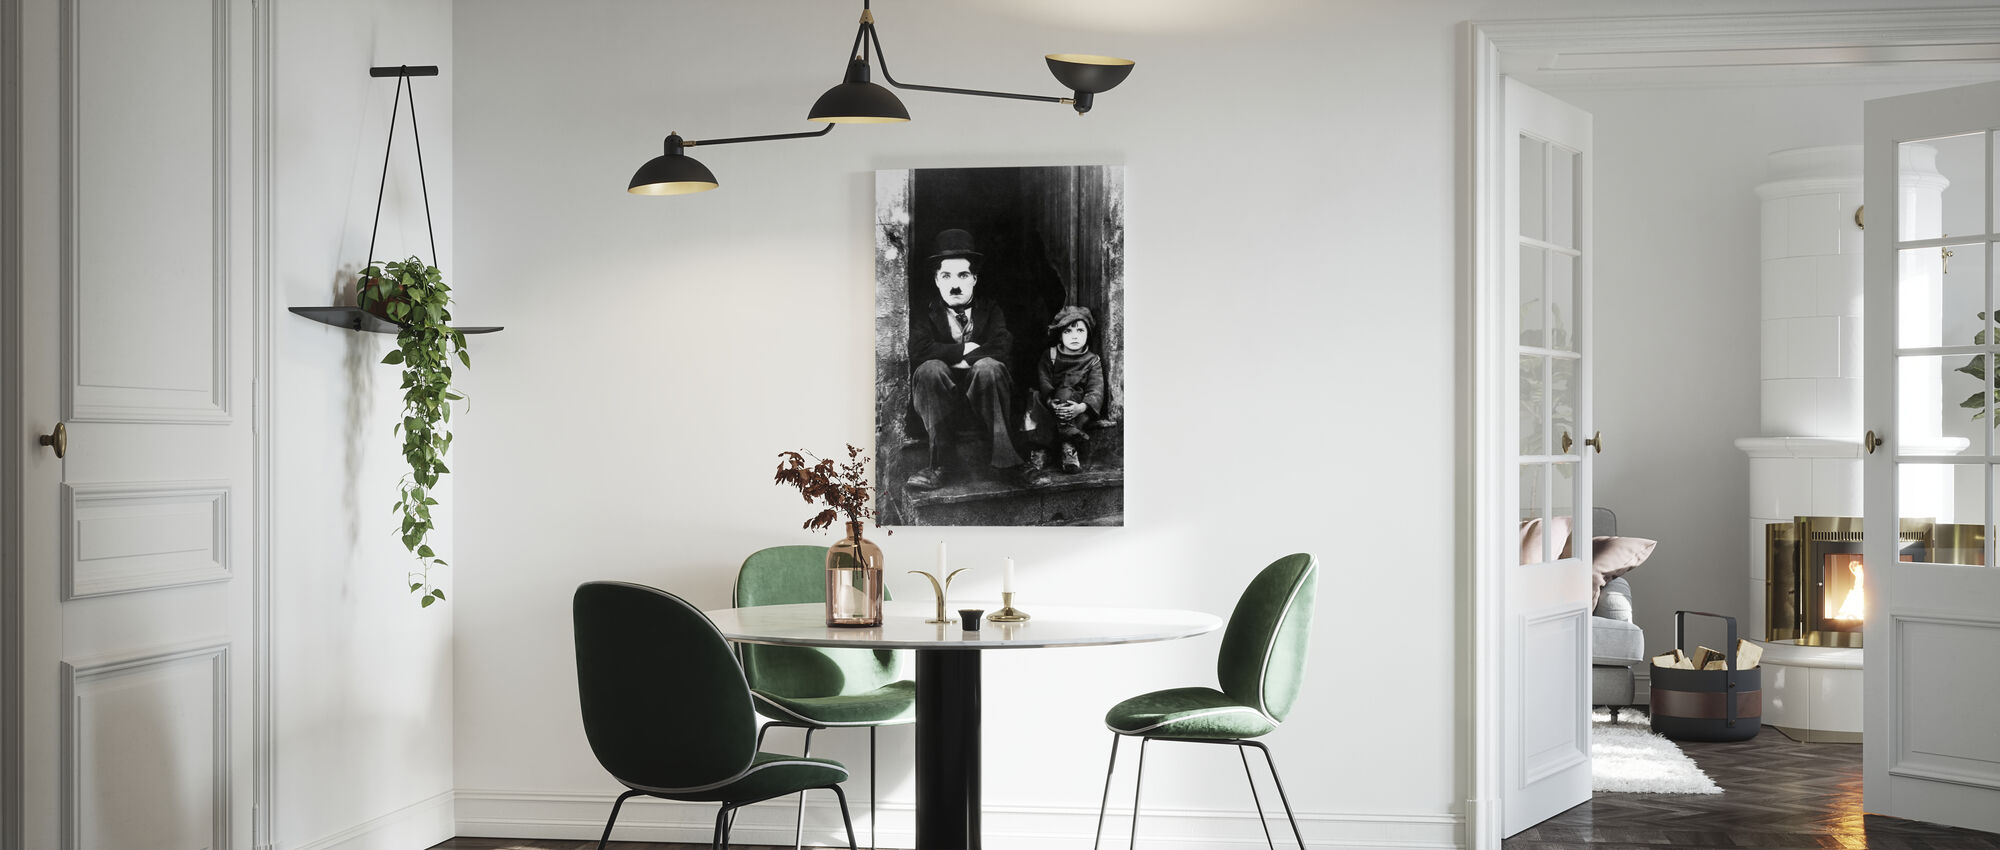 Charlie Chaplin och Jackie Coogan - Canvastavla - Kök